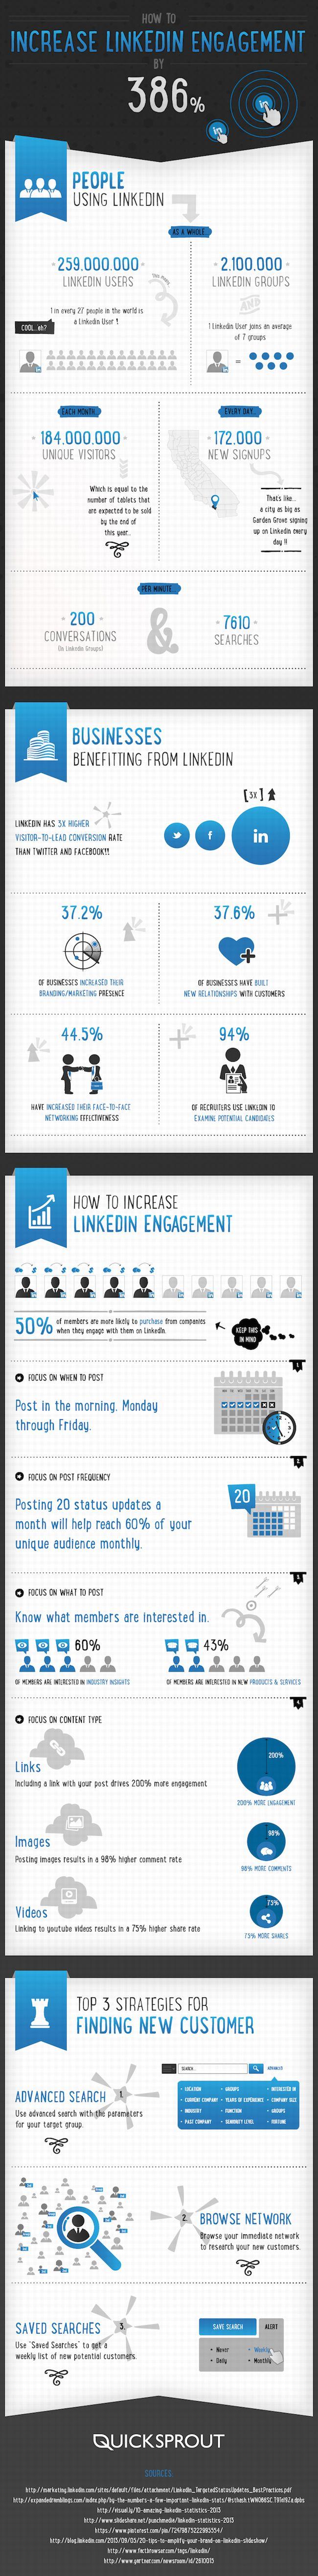 Pin by TribalCafe on Linkedin Infographics | Pinterest